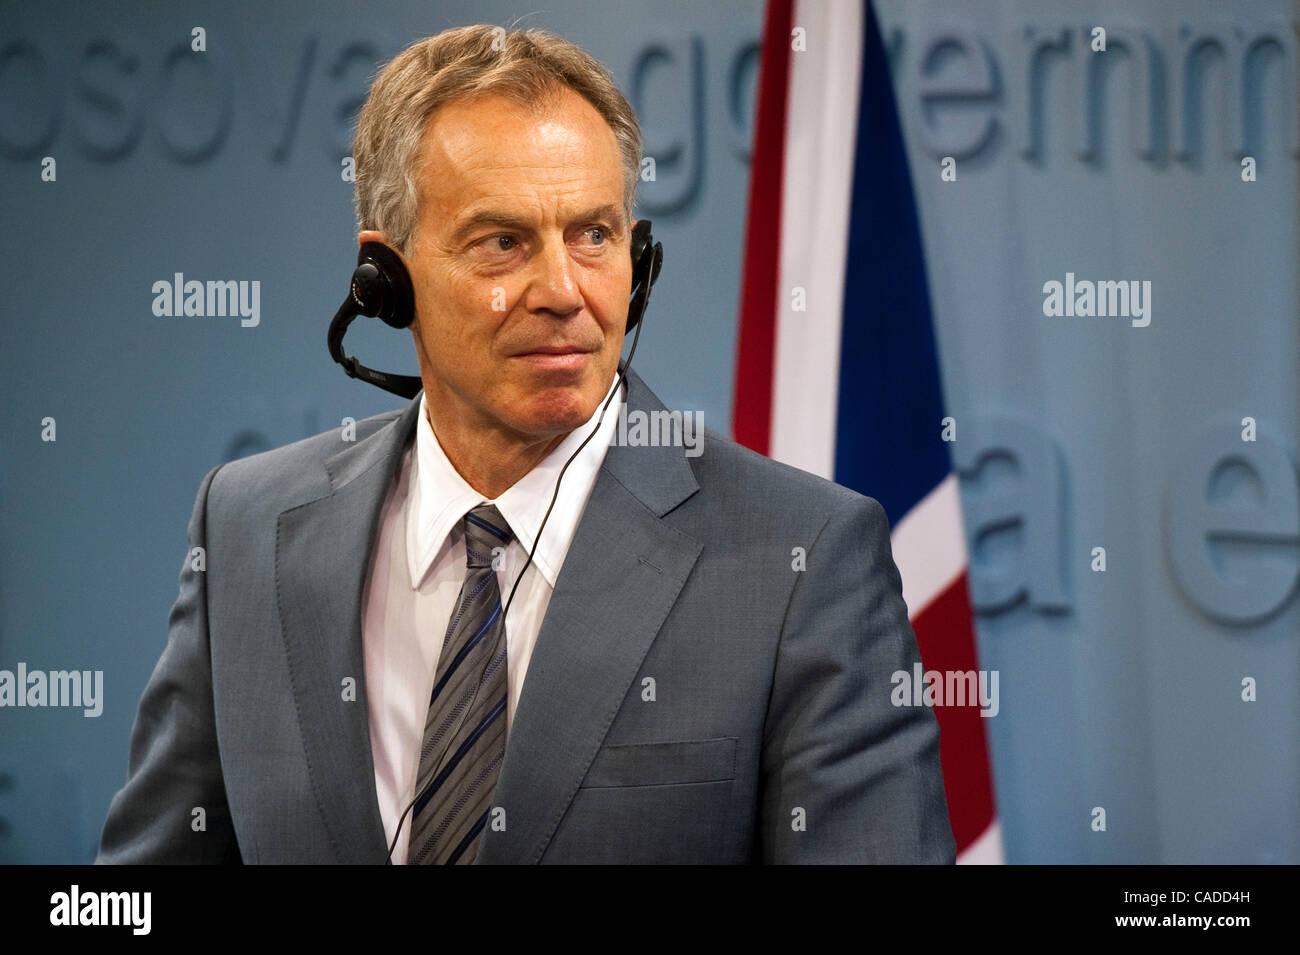 July 08, 2010 - Pristina, Pristina, Kosovo - Britain's former prime minister TONY BLAIR during the press conference Stock Photo